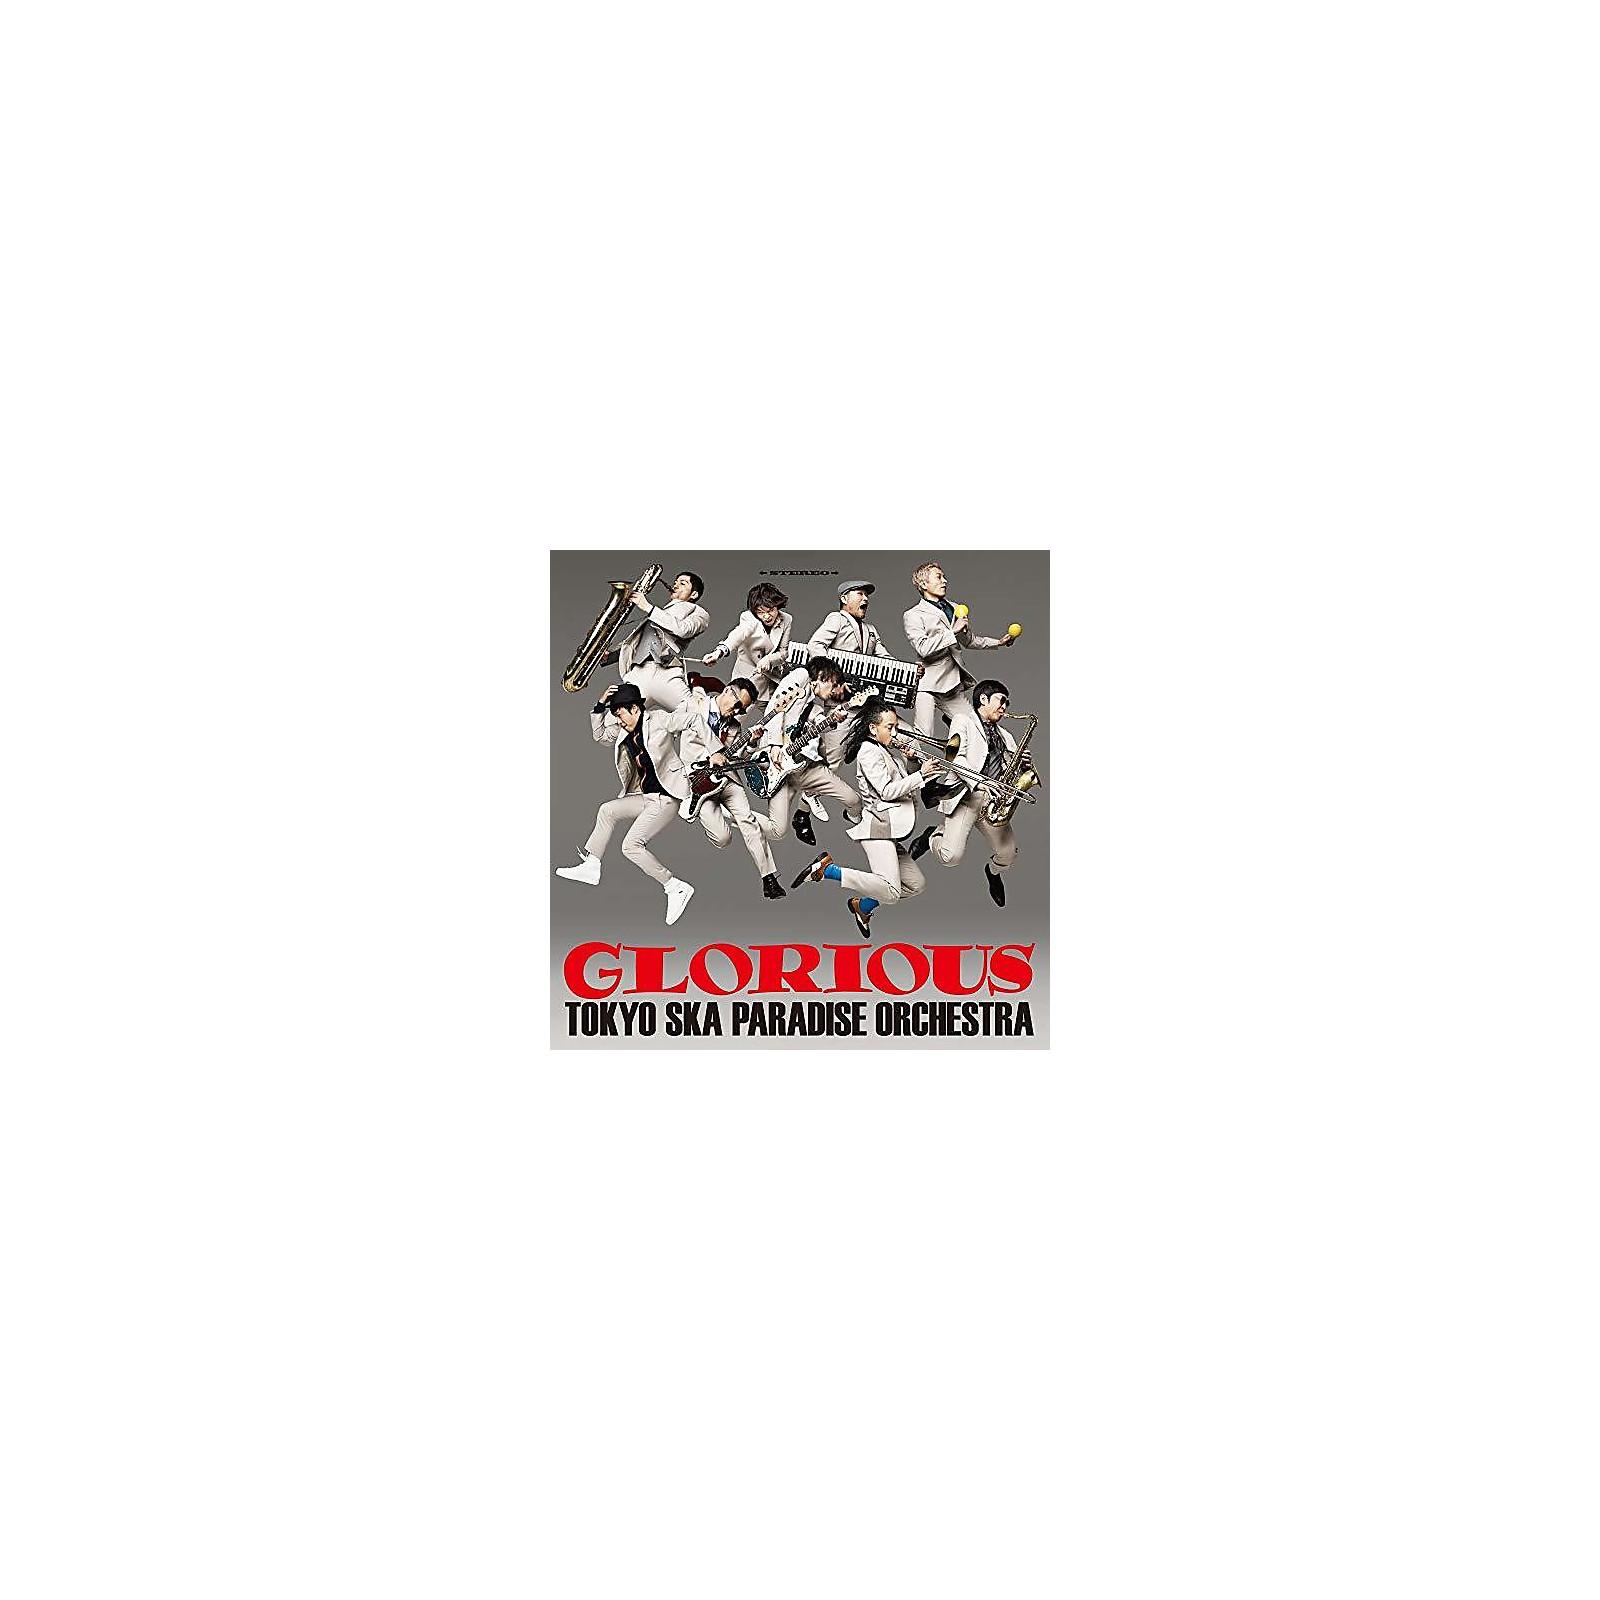 Alliance Tokyo Ska Paradise Orchestra - Glorious